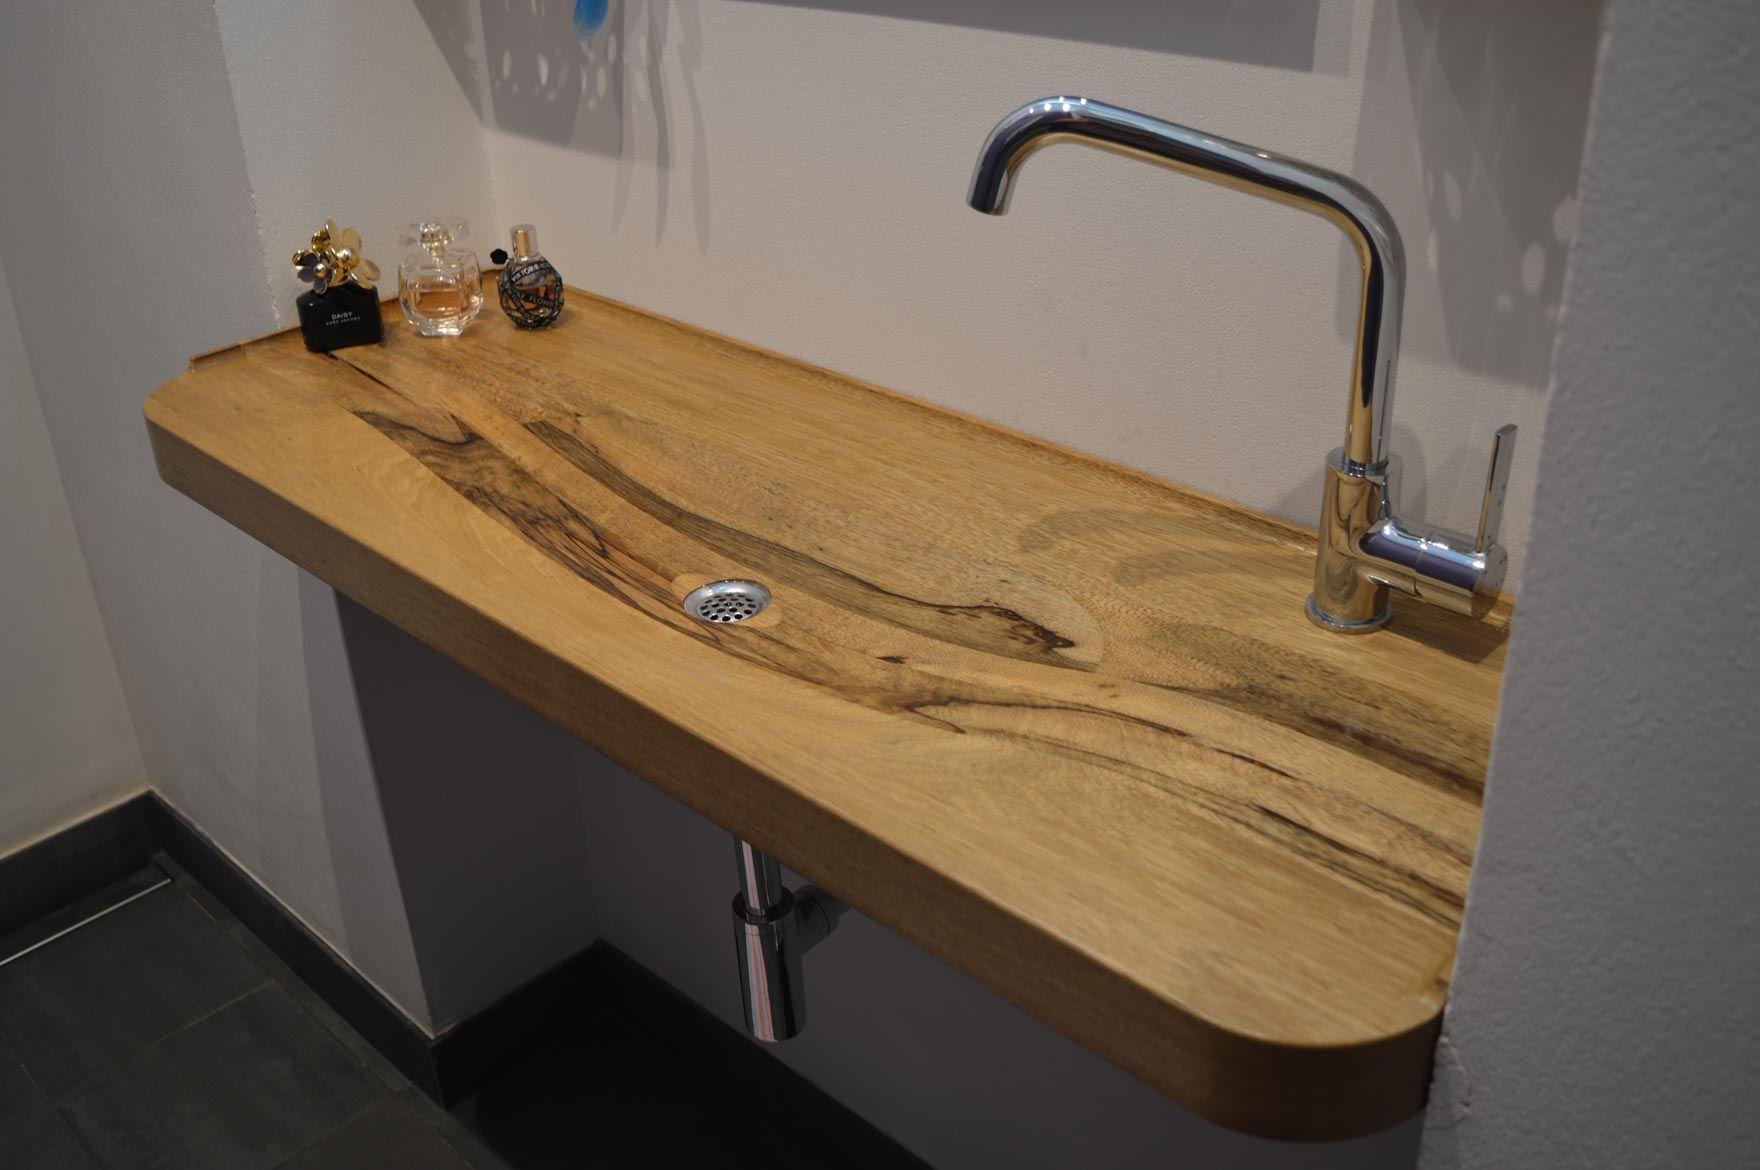 Wastafel Op Maat : Houten wastafel op maat in kleine amsterdamse badkamer interior